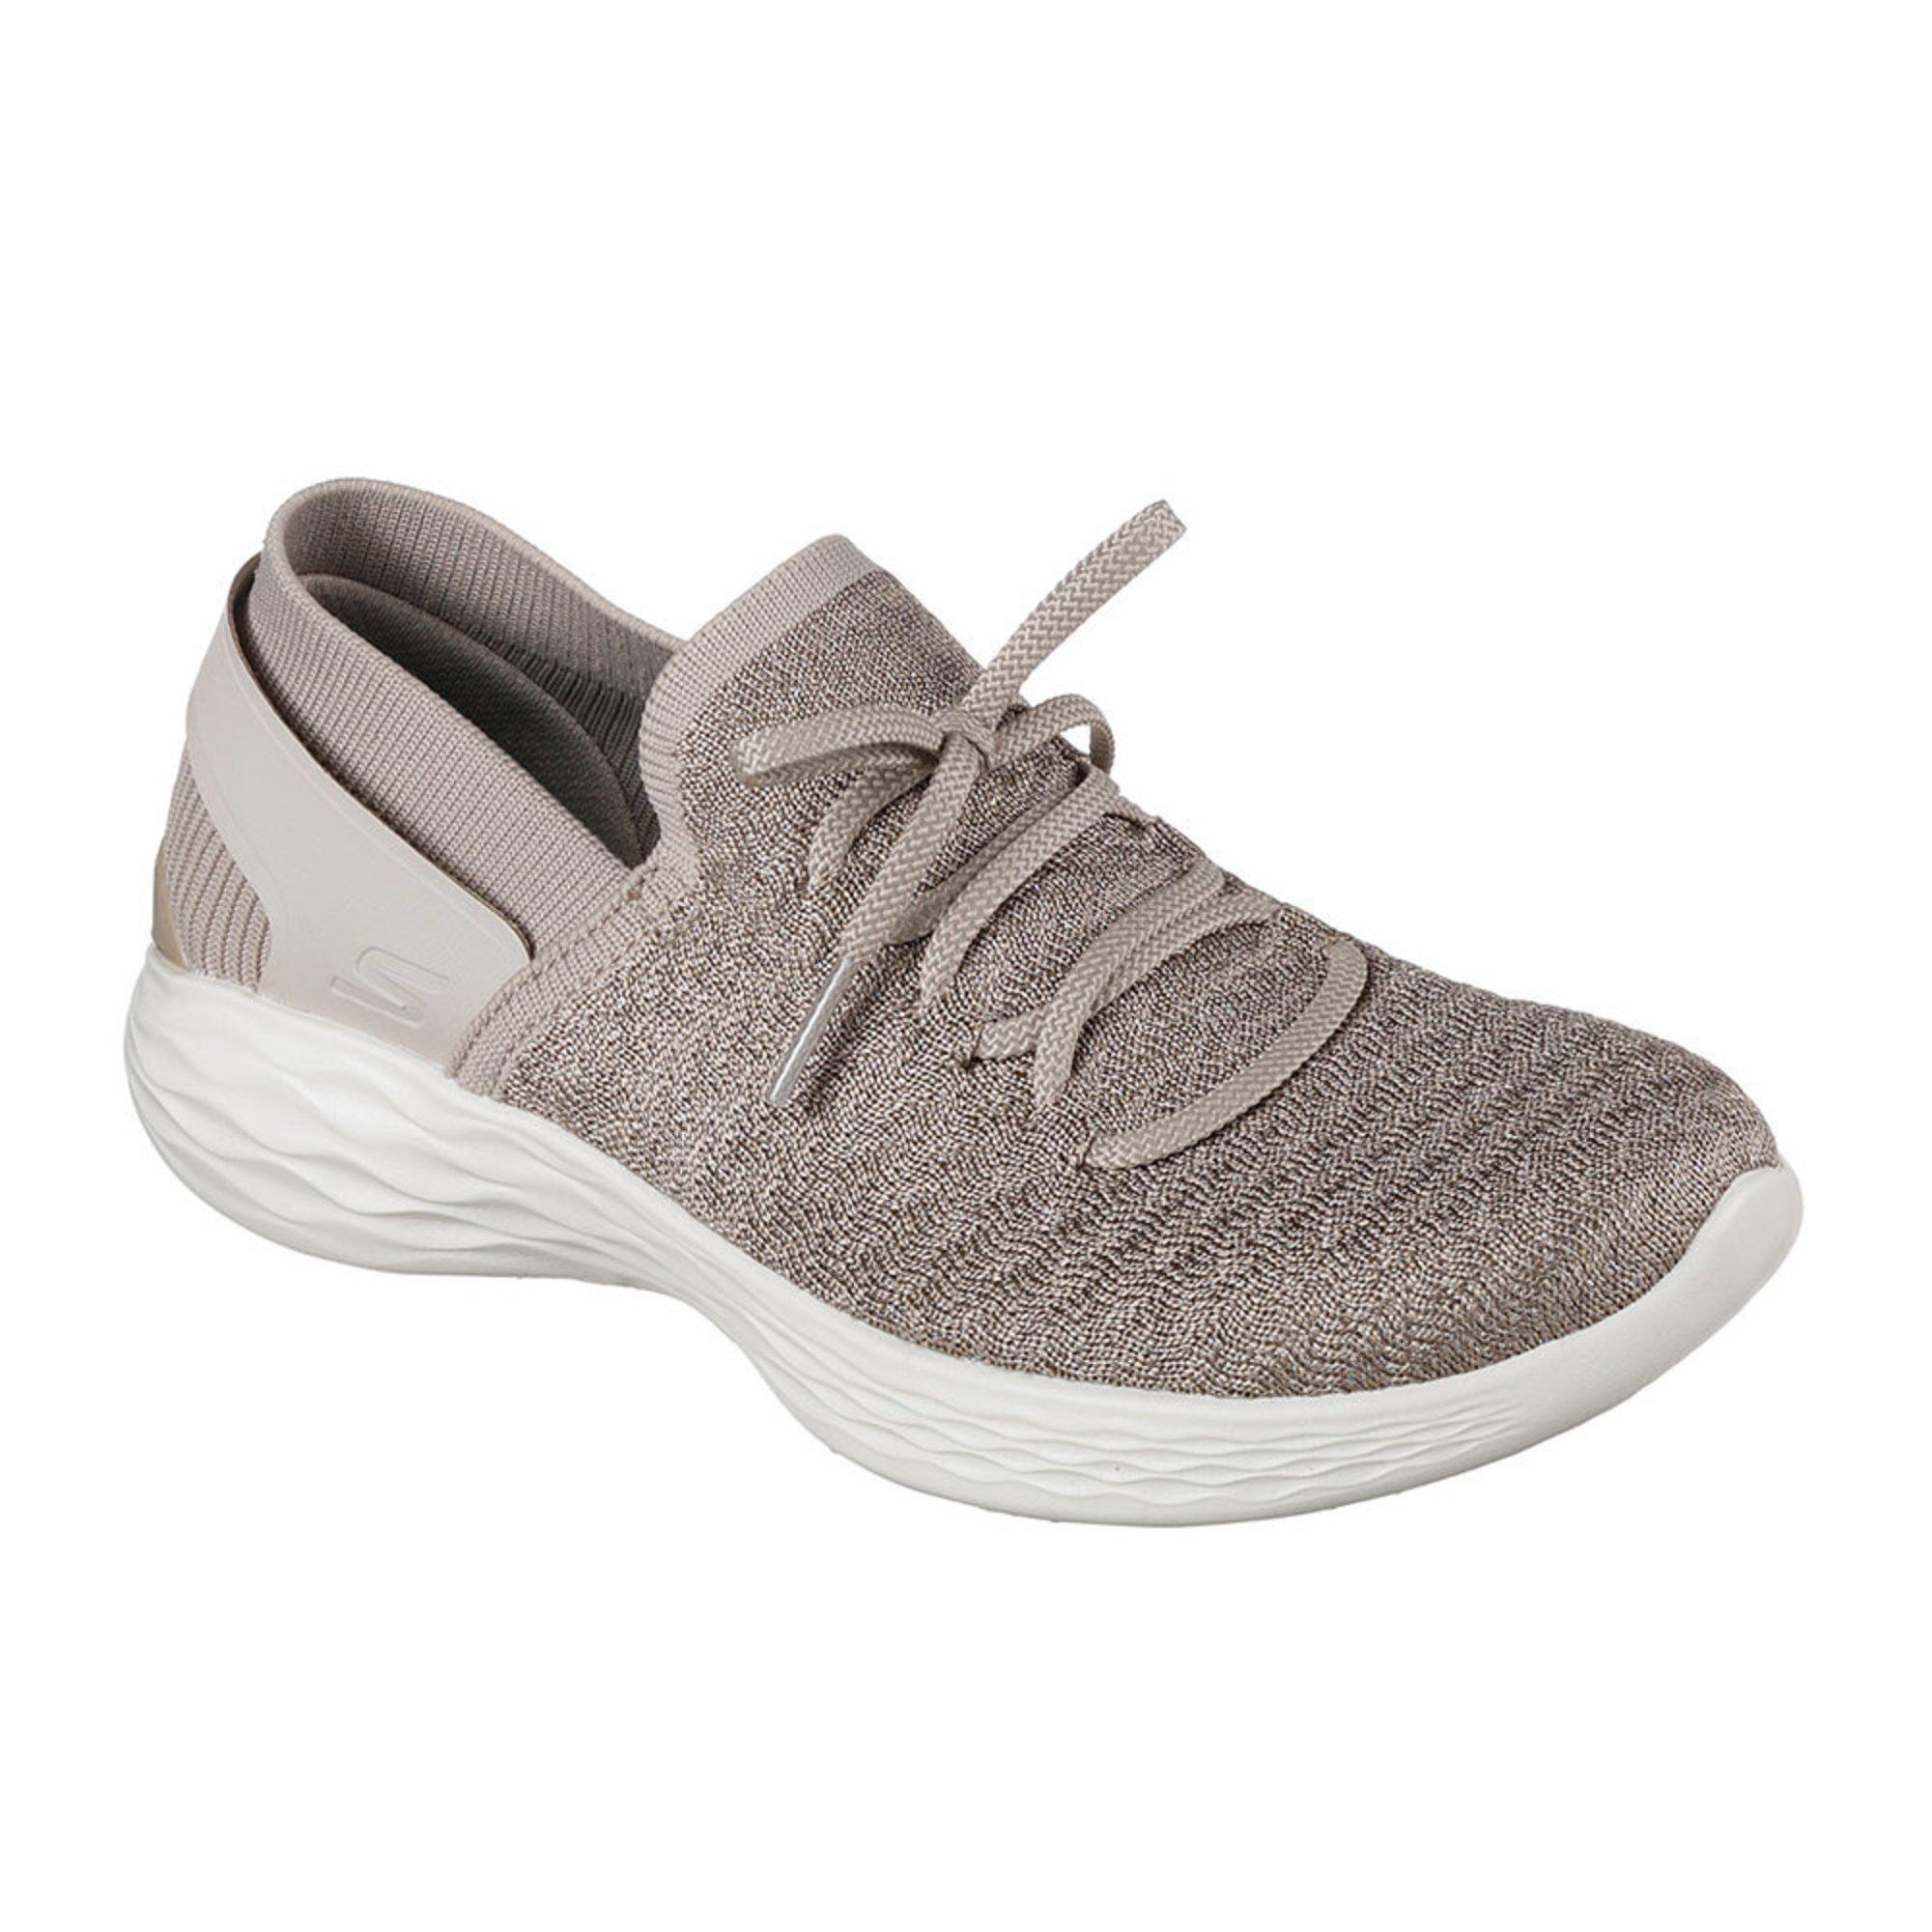 4a2e954d Skechers Women's Sport You Beginning Lace Up Sneaker | Women's ...